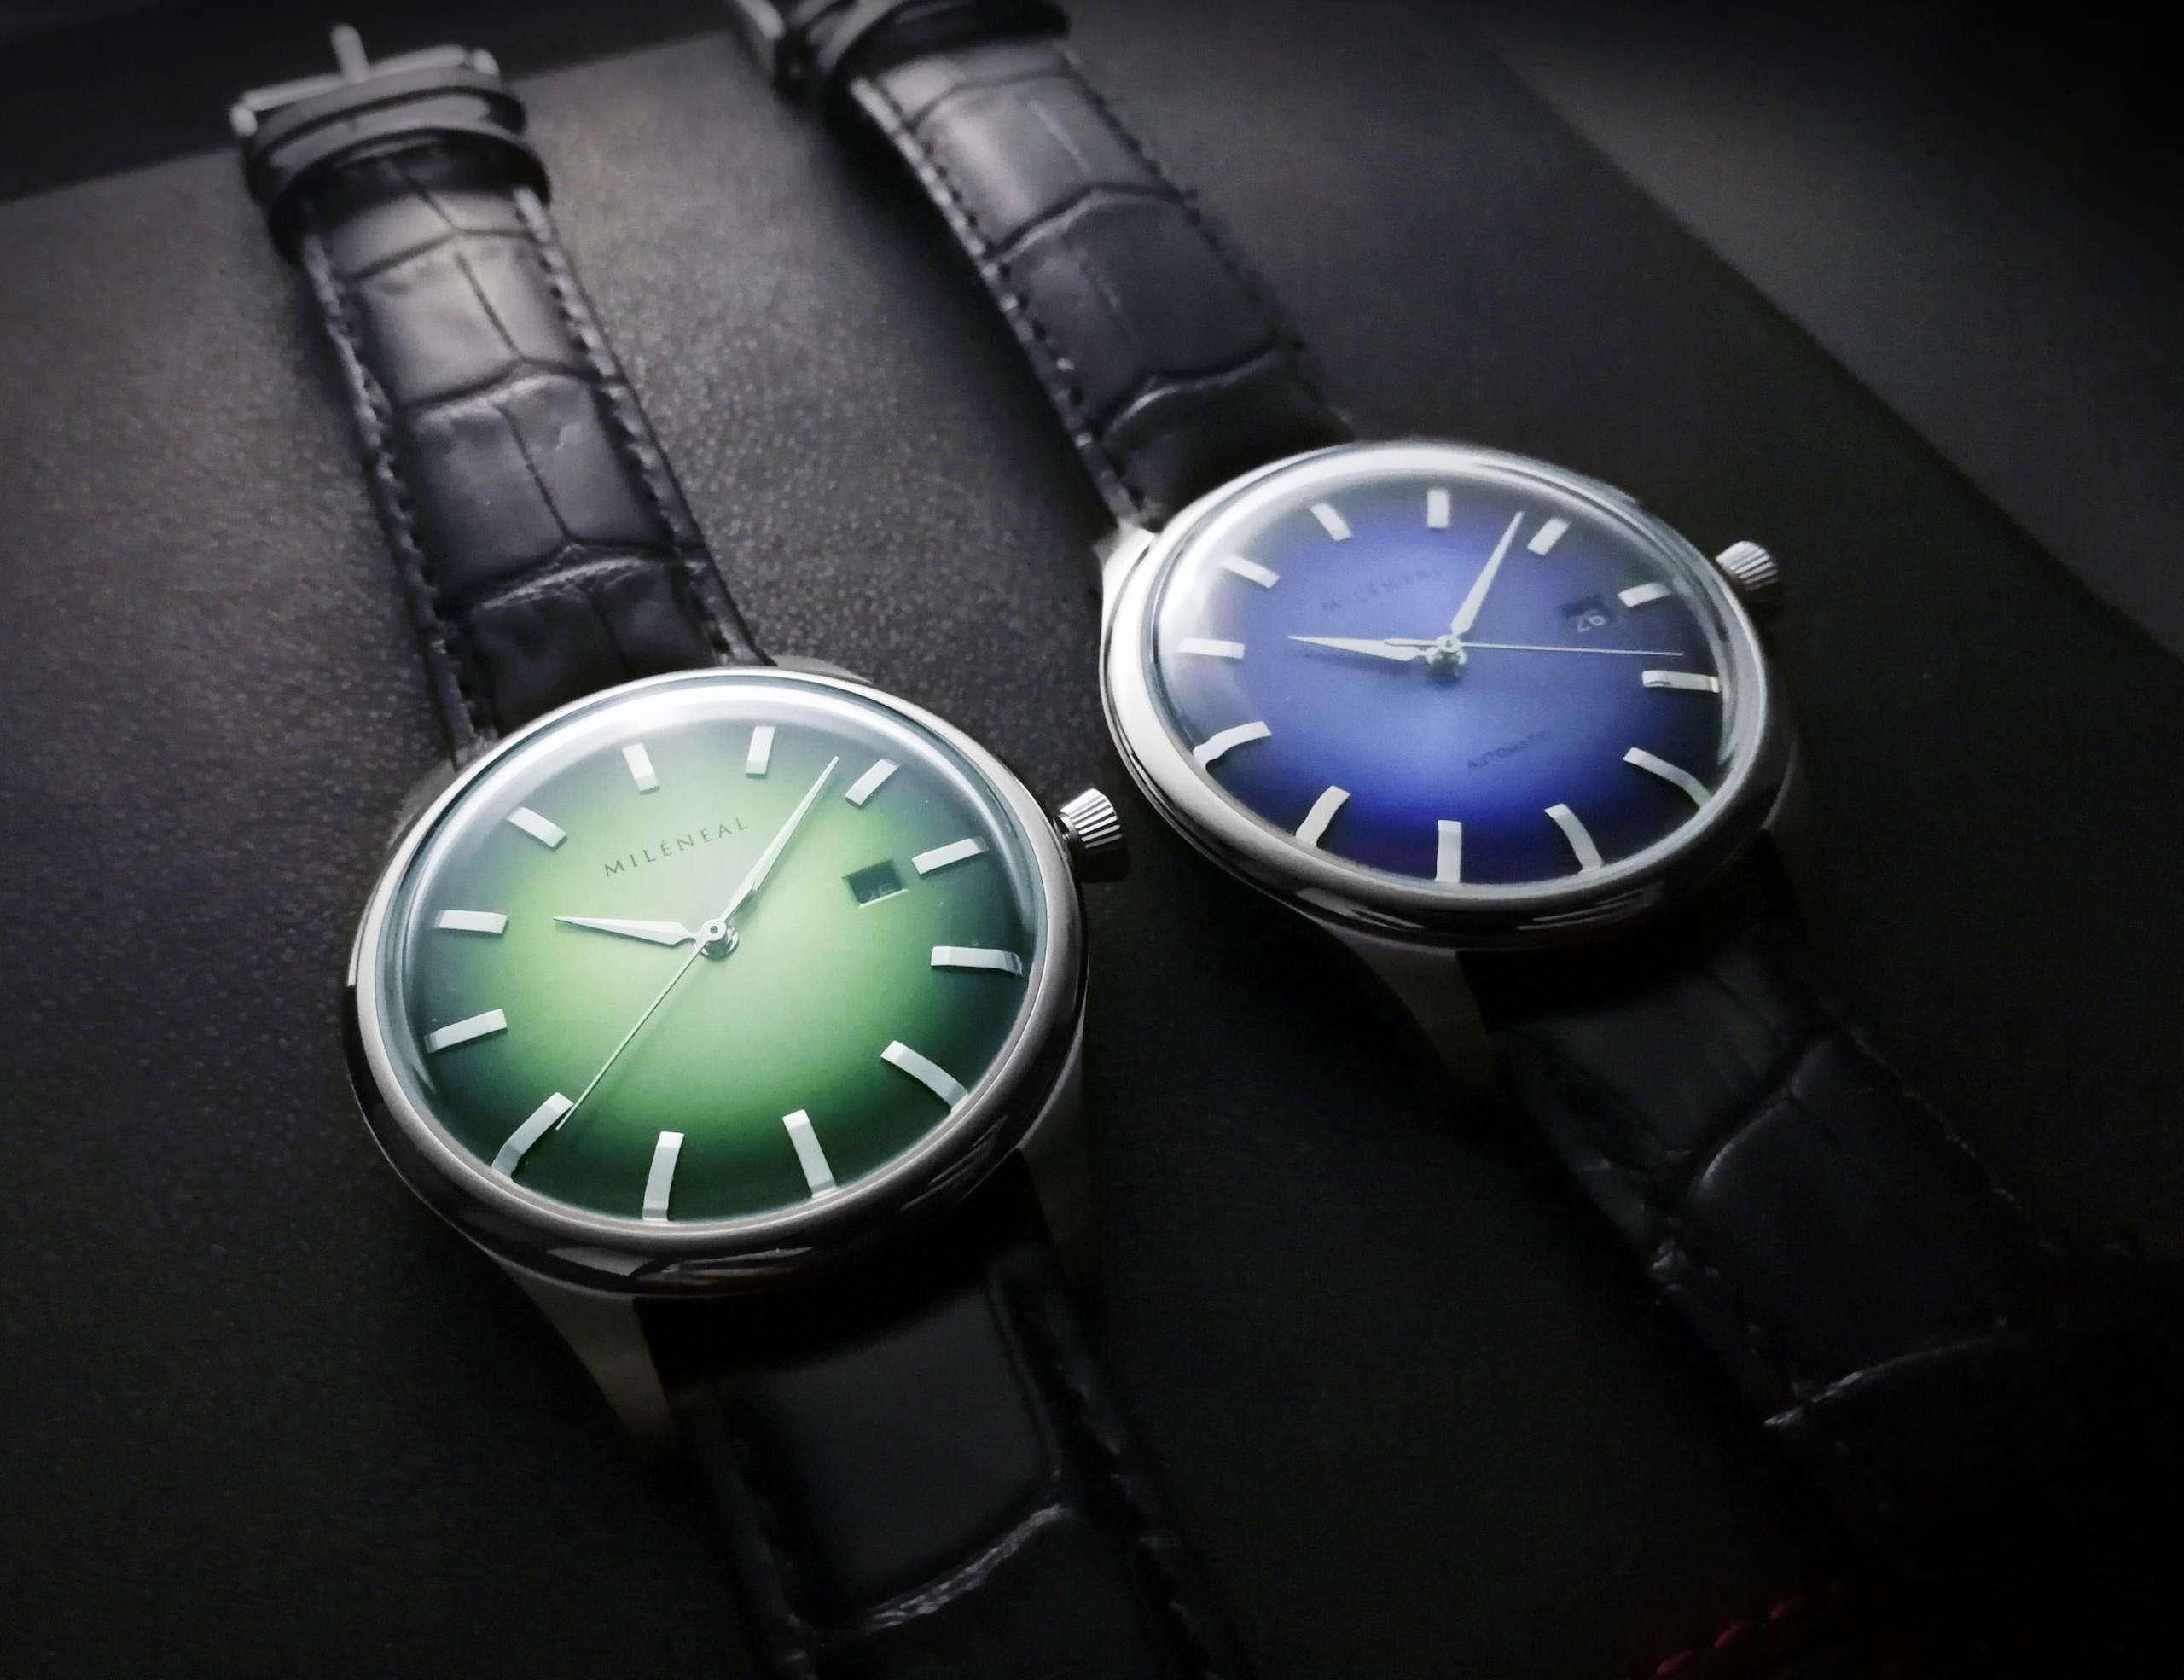 MILENEAL Prestige Automatic Dress Watch